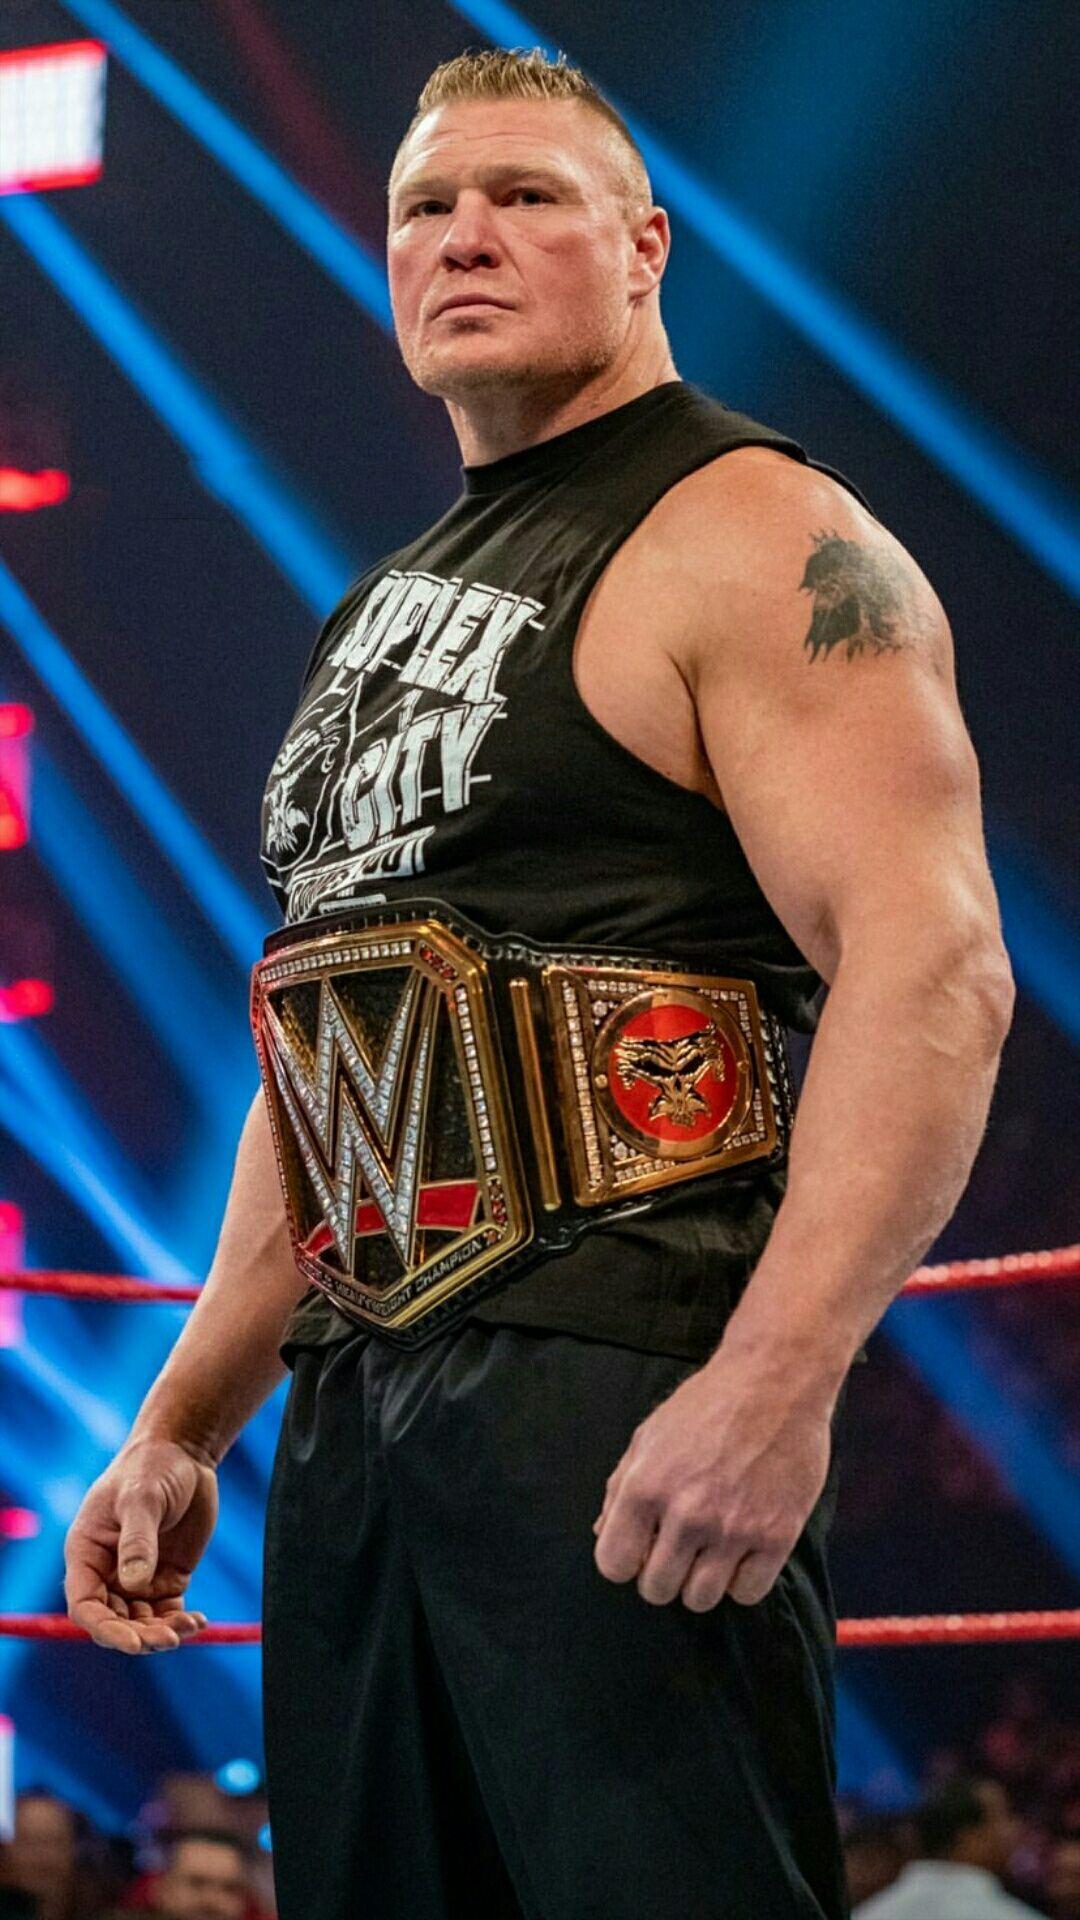 Pin By Maruf Hossan On Sports Brock Lesnar Wwe Superstar Roman Reigns Brock Lesnar Wwe